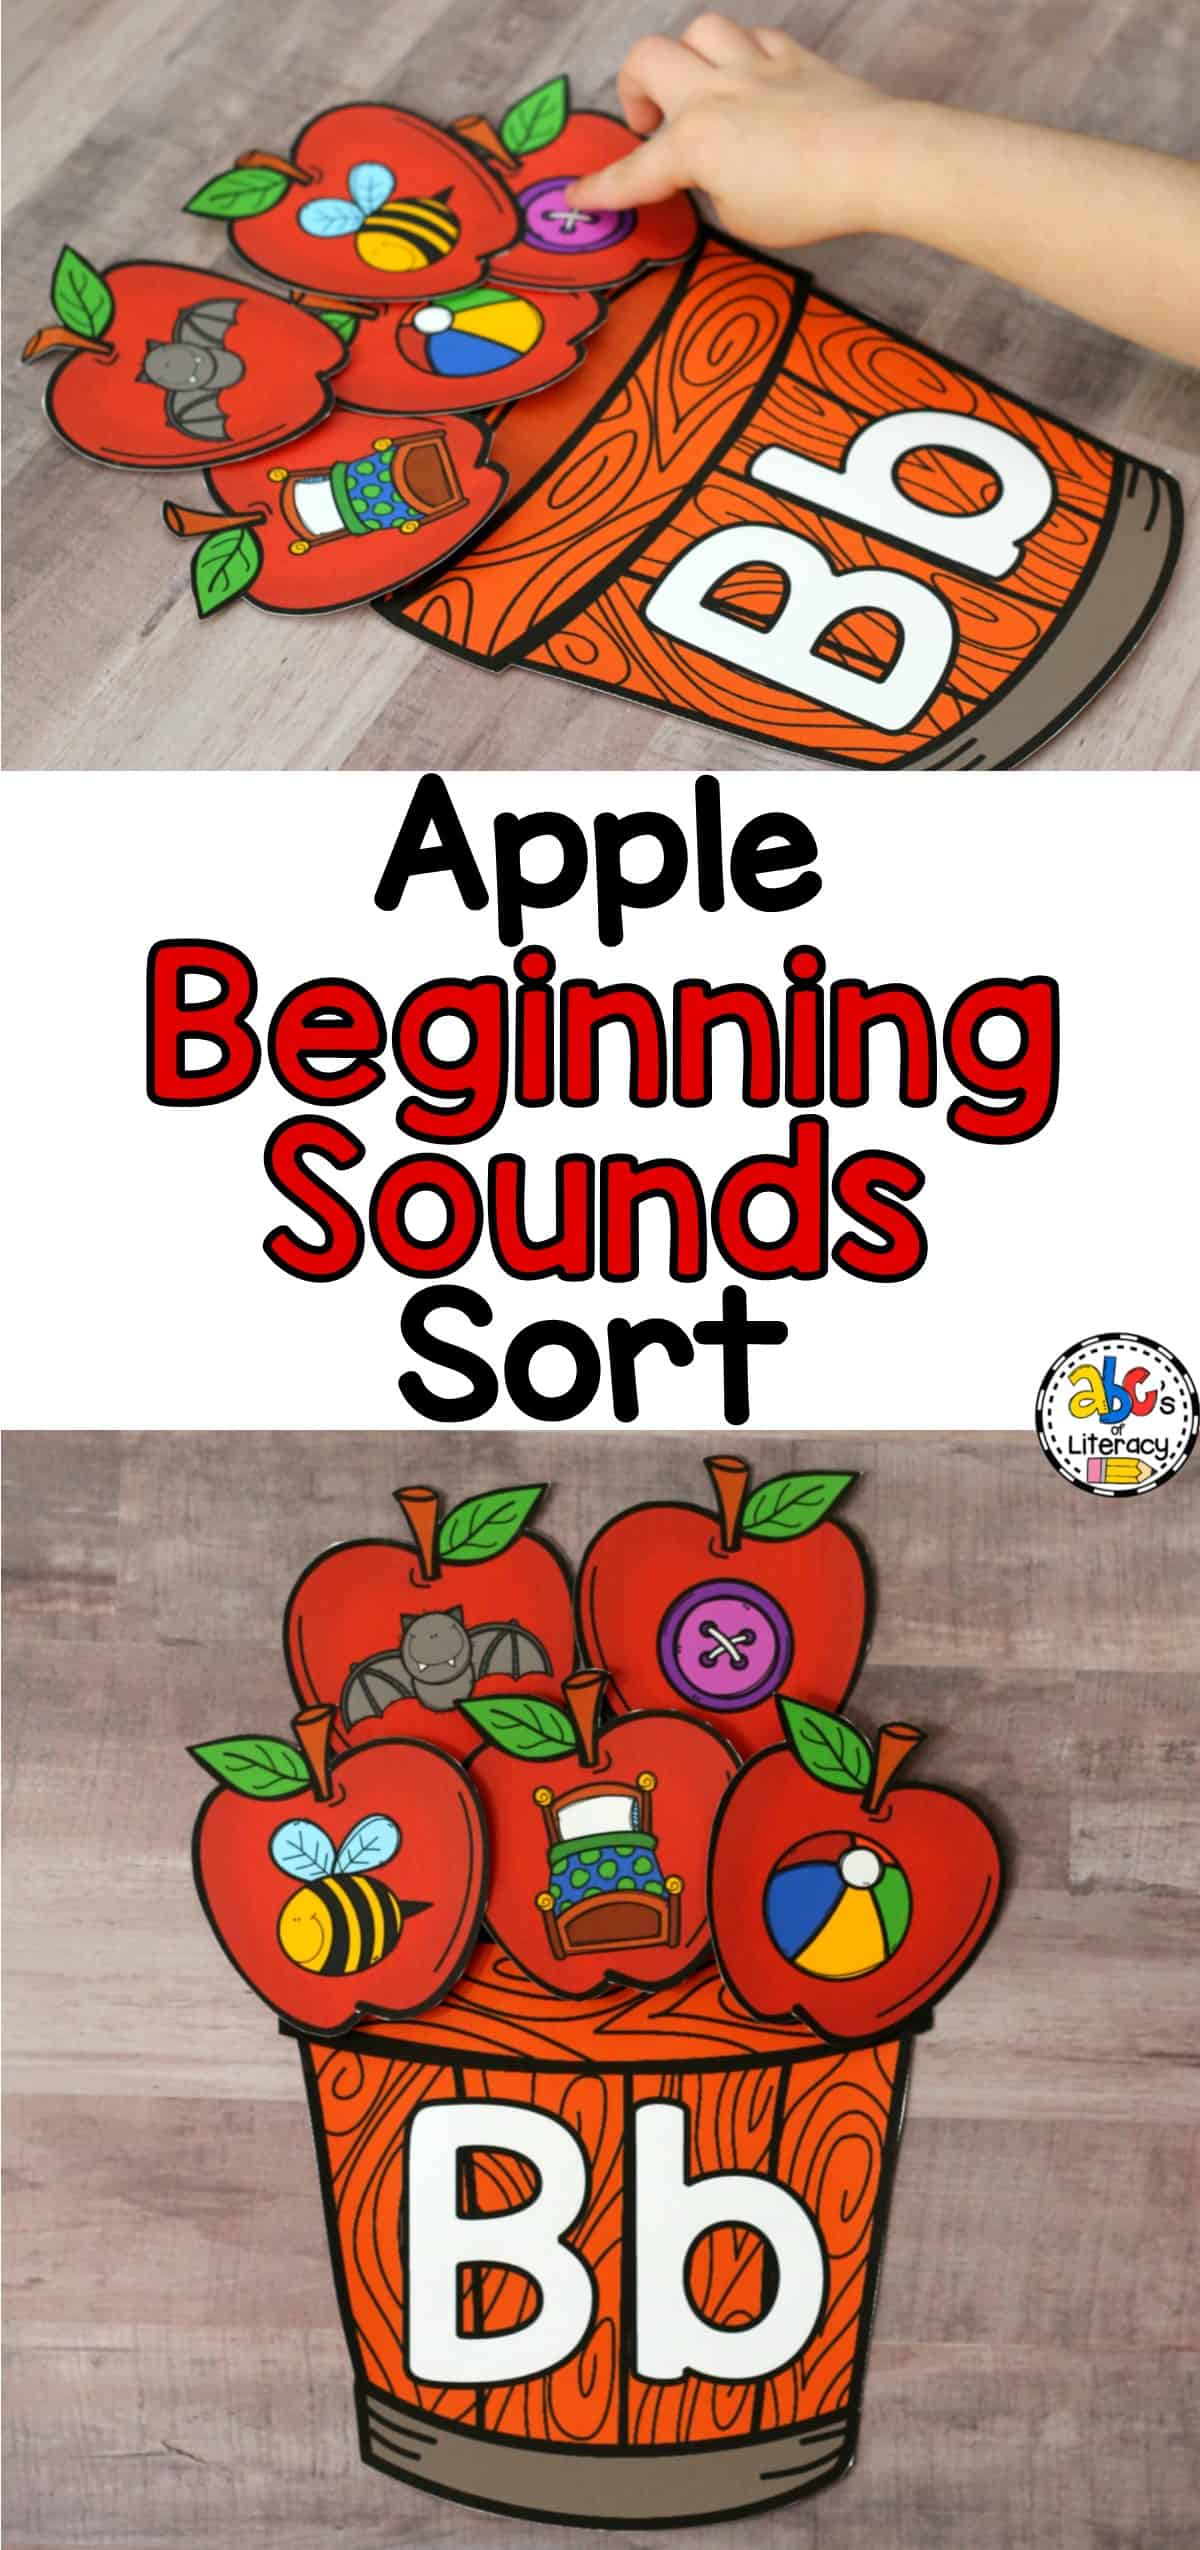 Apple Beginning Sounds Sort, Apple Literacy Center, Apple Morning Tub, Fall Literacy Center, Fall Morning Tub, Beginning Sounds Sort, Beginning Sounds Activity